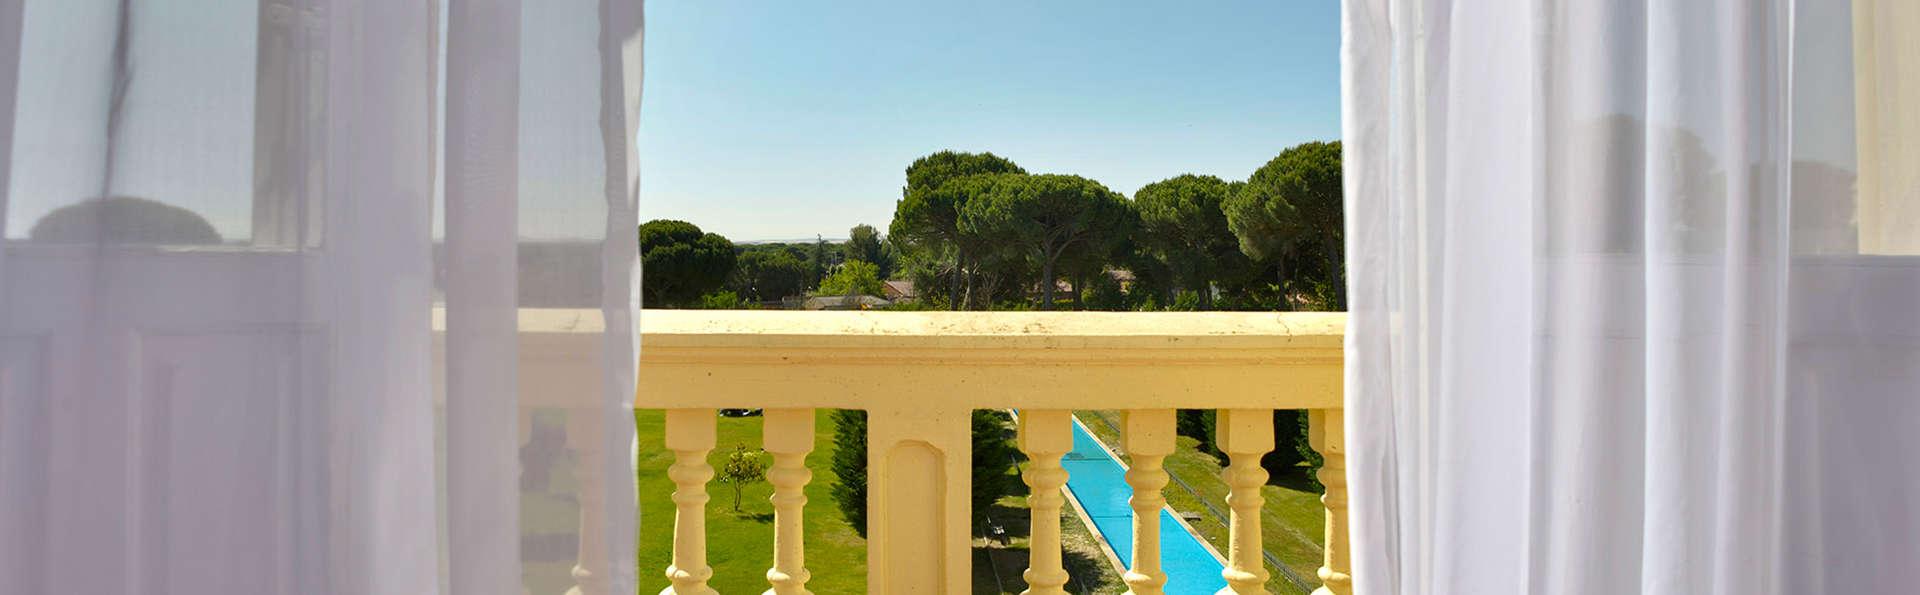 Balneario Hotel Palacio de las Salinas - EDIT_view.jpg